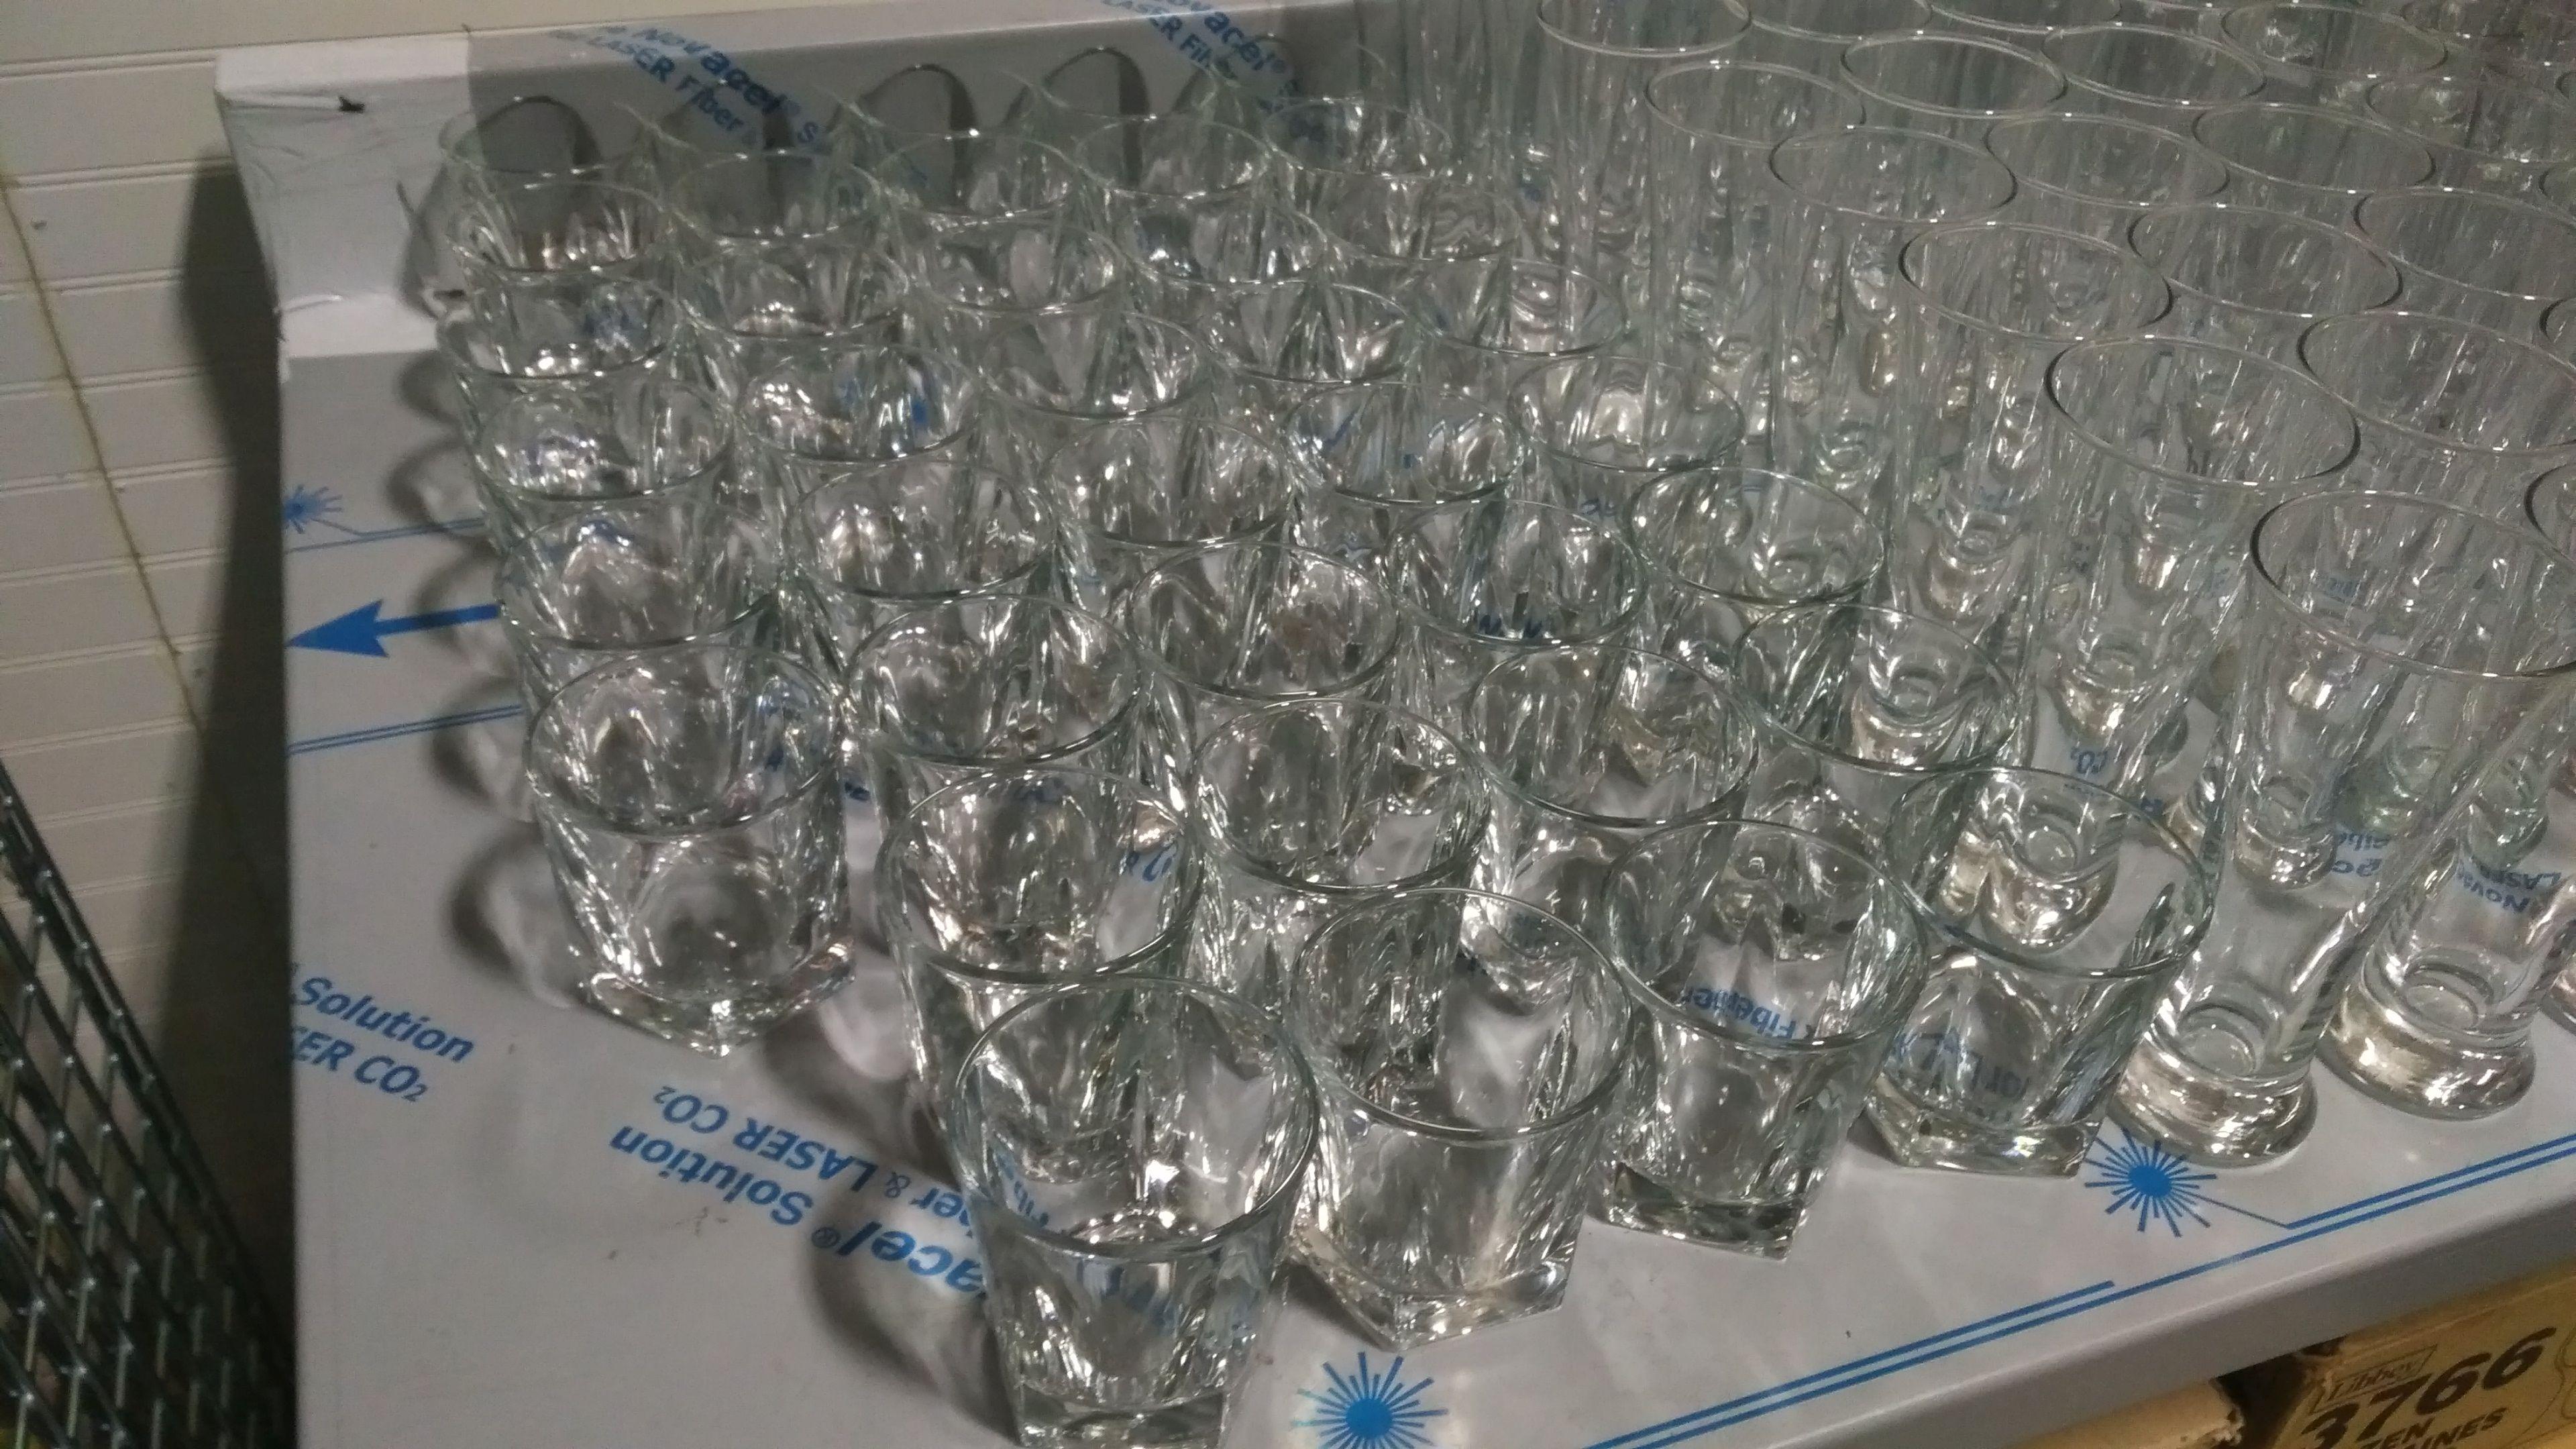 Lot 17 - Libbey Half Size DuraTuff Cooler Glasses - Lot of 43